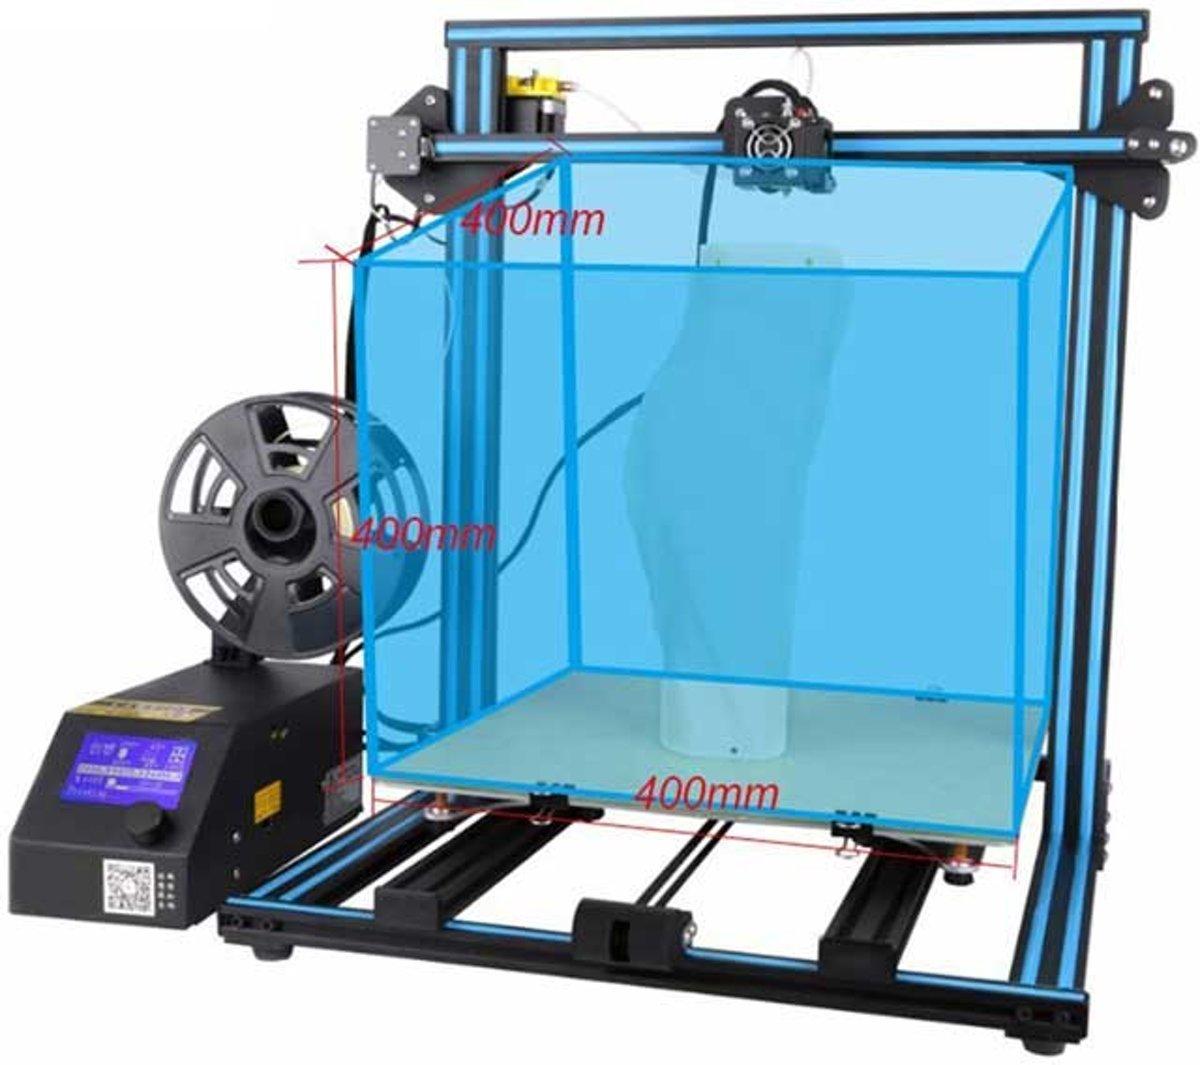 Creality CR-10-S4 - Grote 3D-printer 400*400*400mm kopen